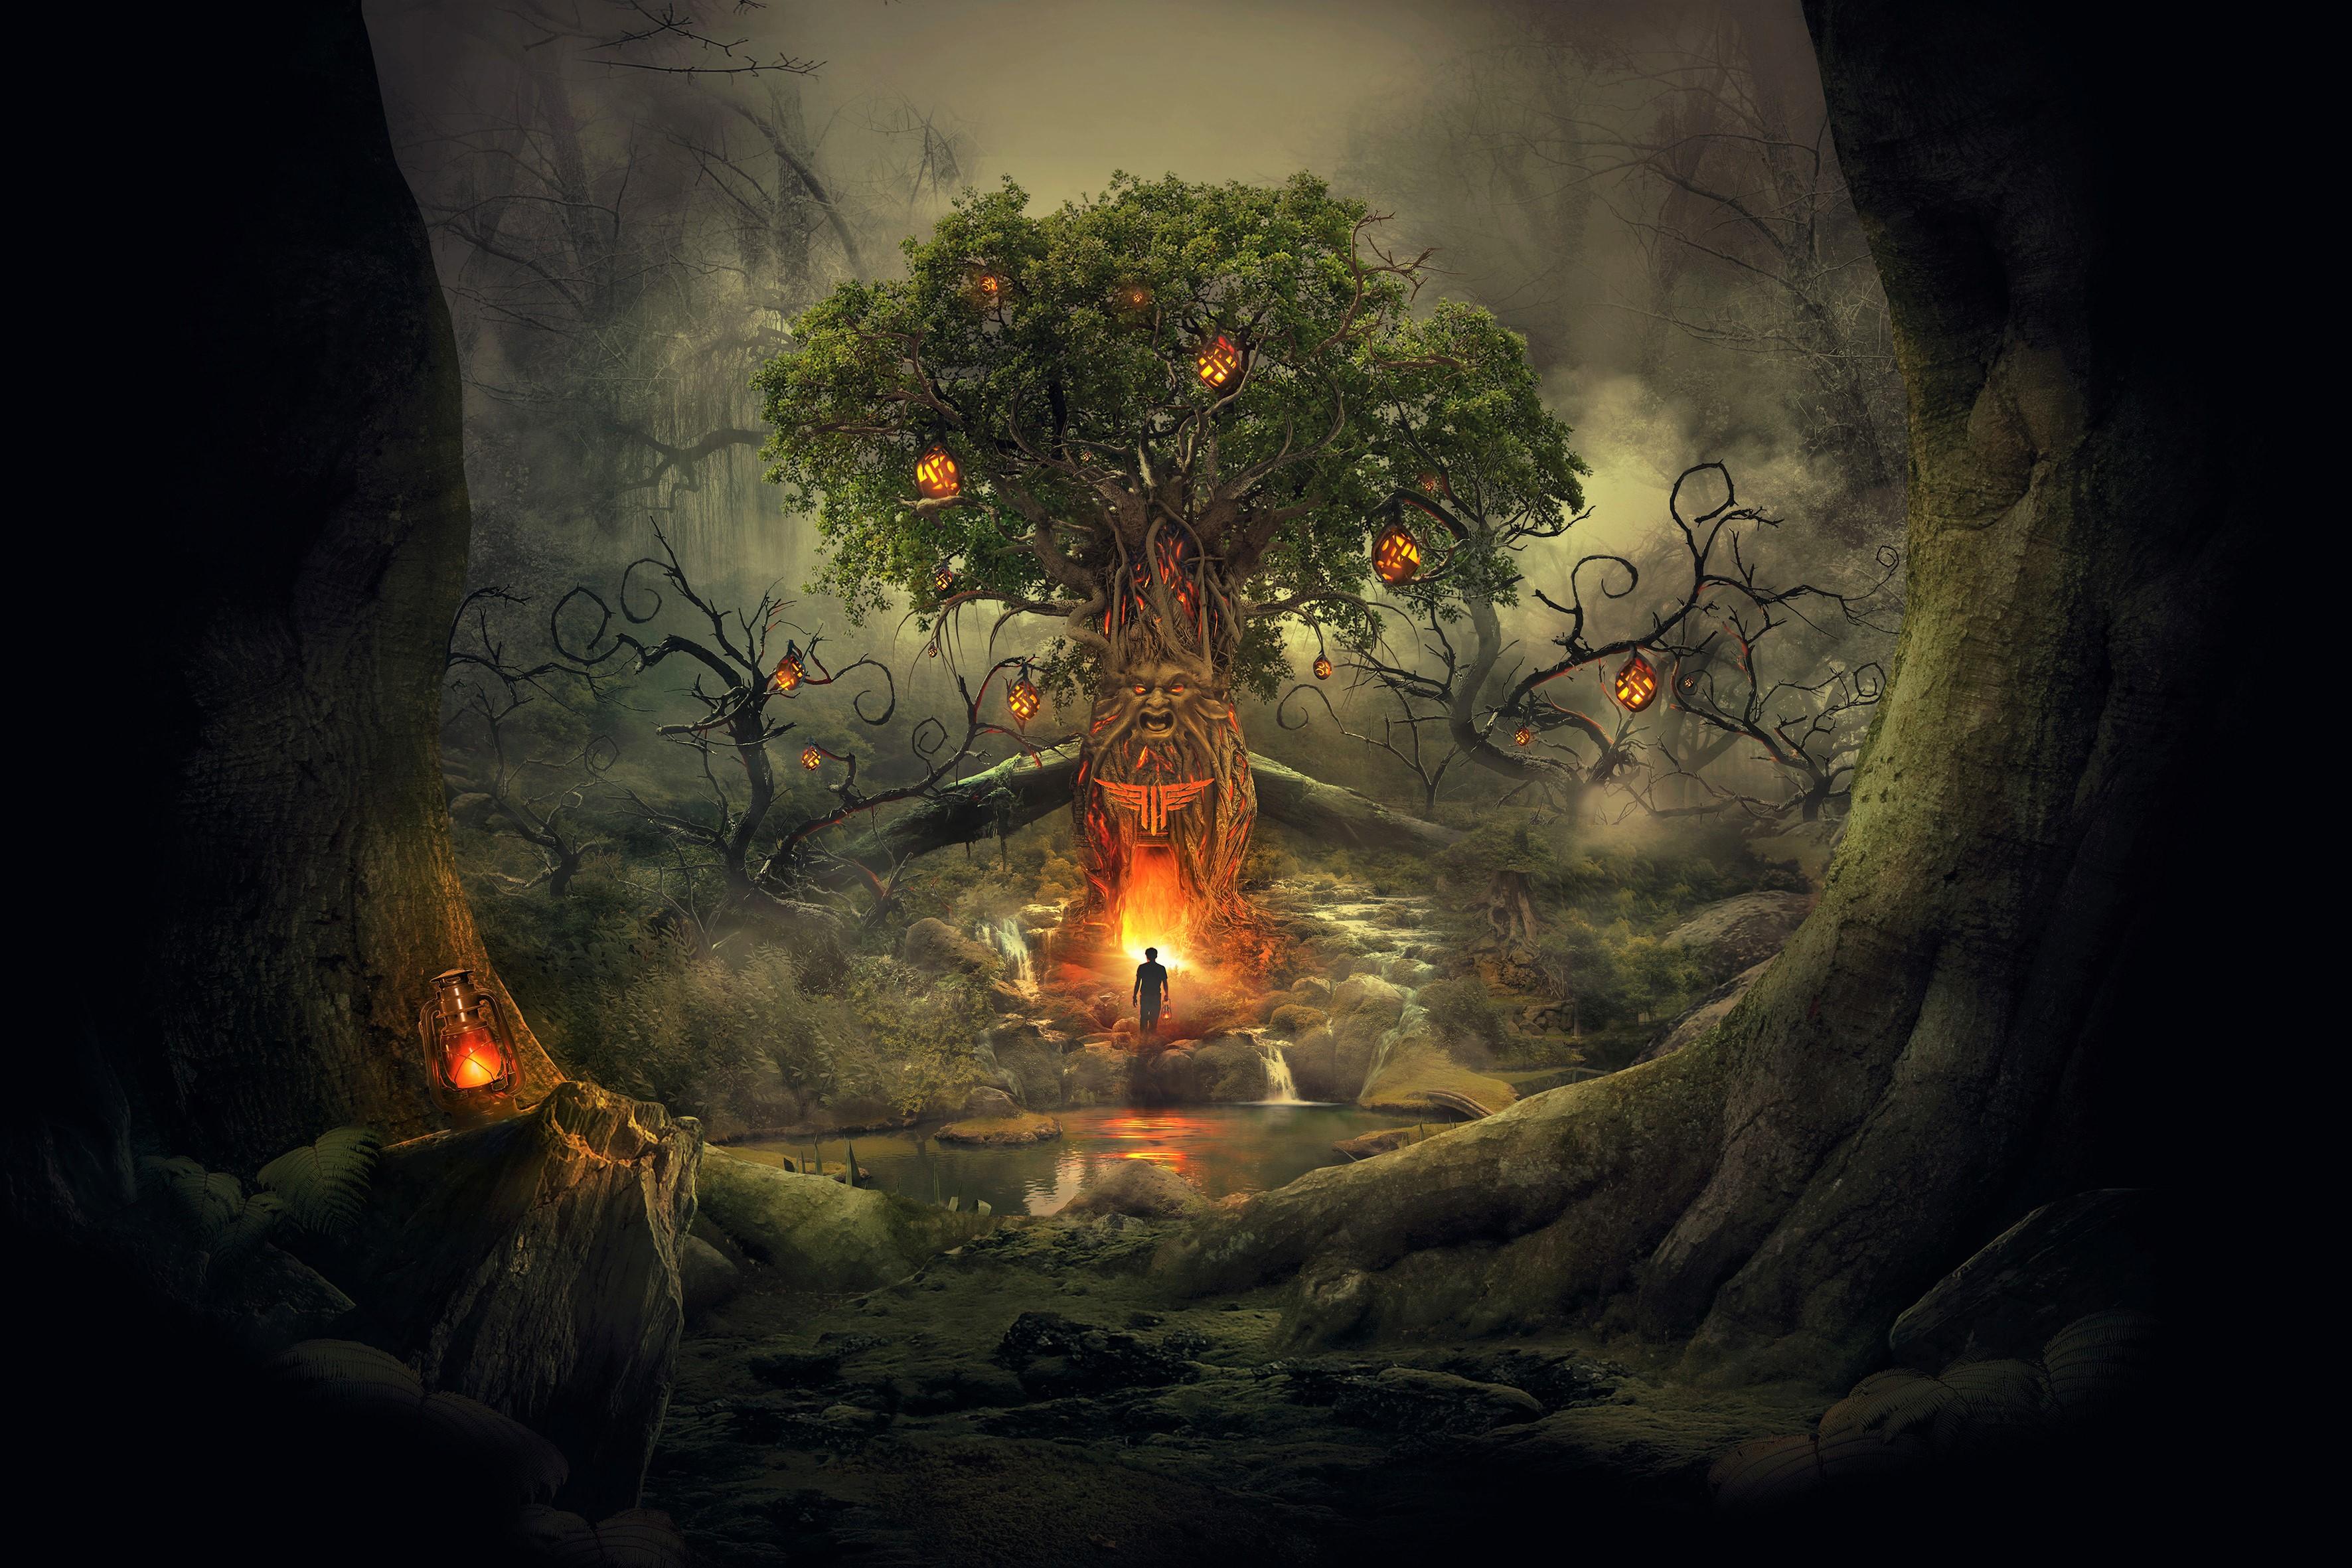 Tree Of Eternal Life Hd Wallpaper Background Image 3543x2362